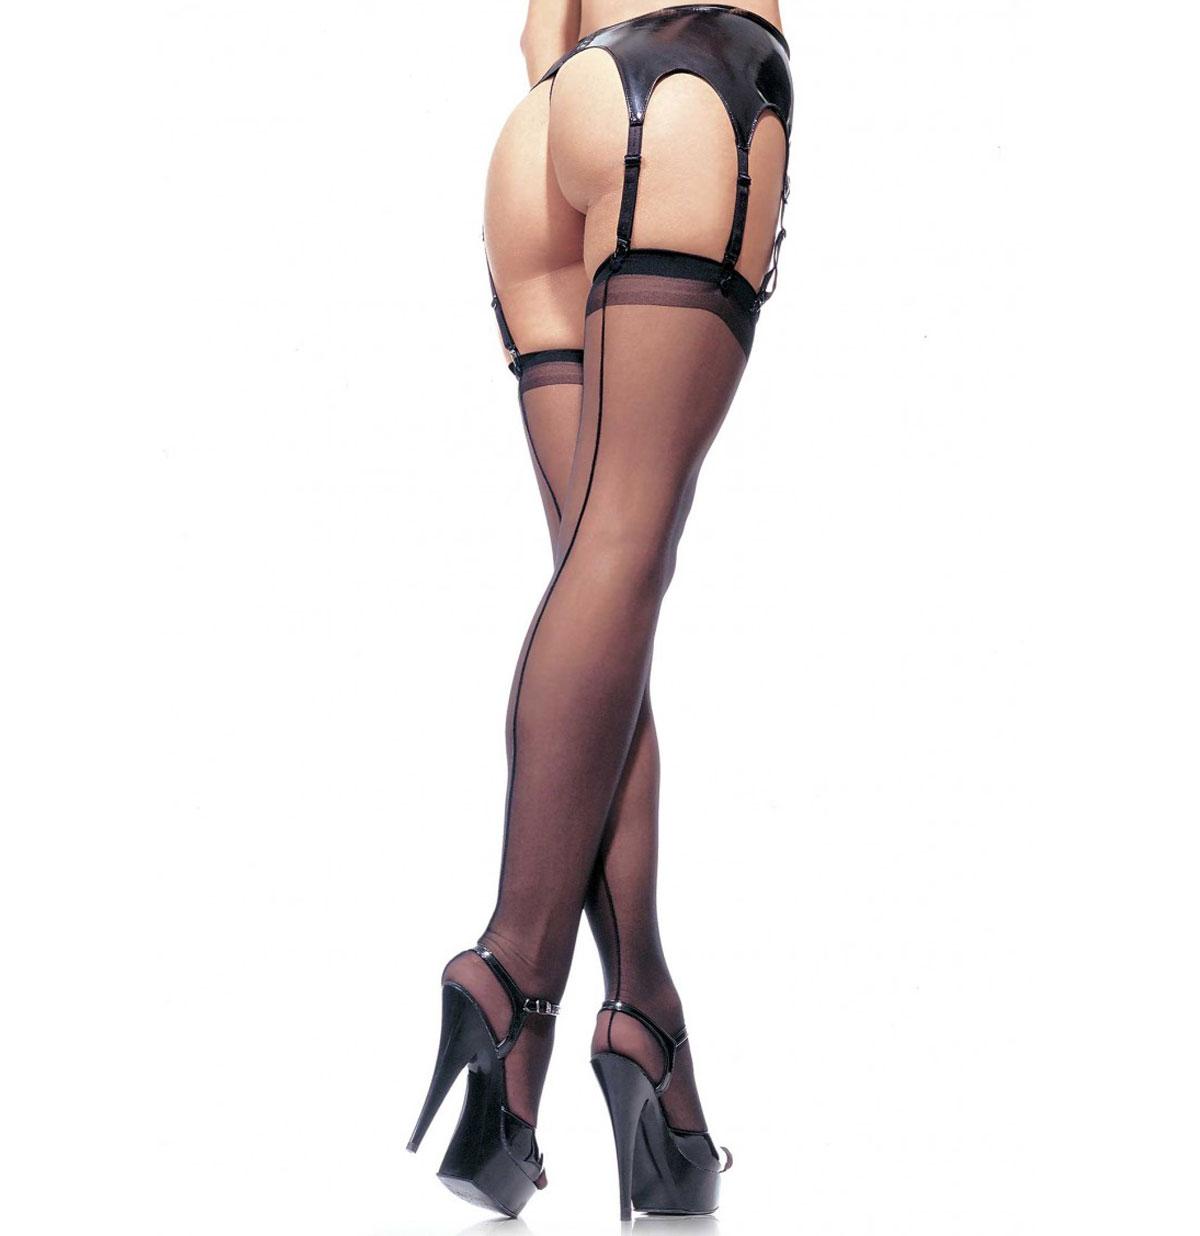 Sheer Stockings Black Seam - Plus Size